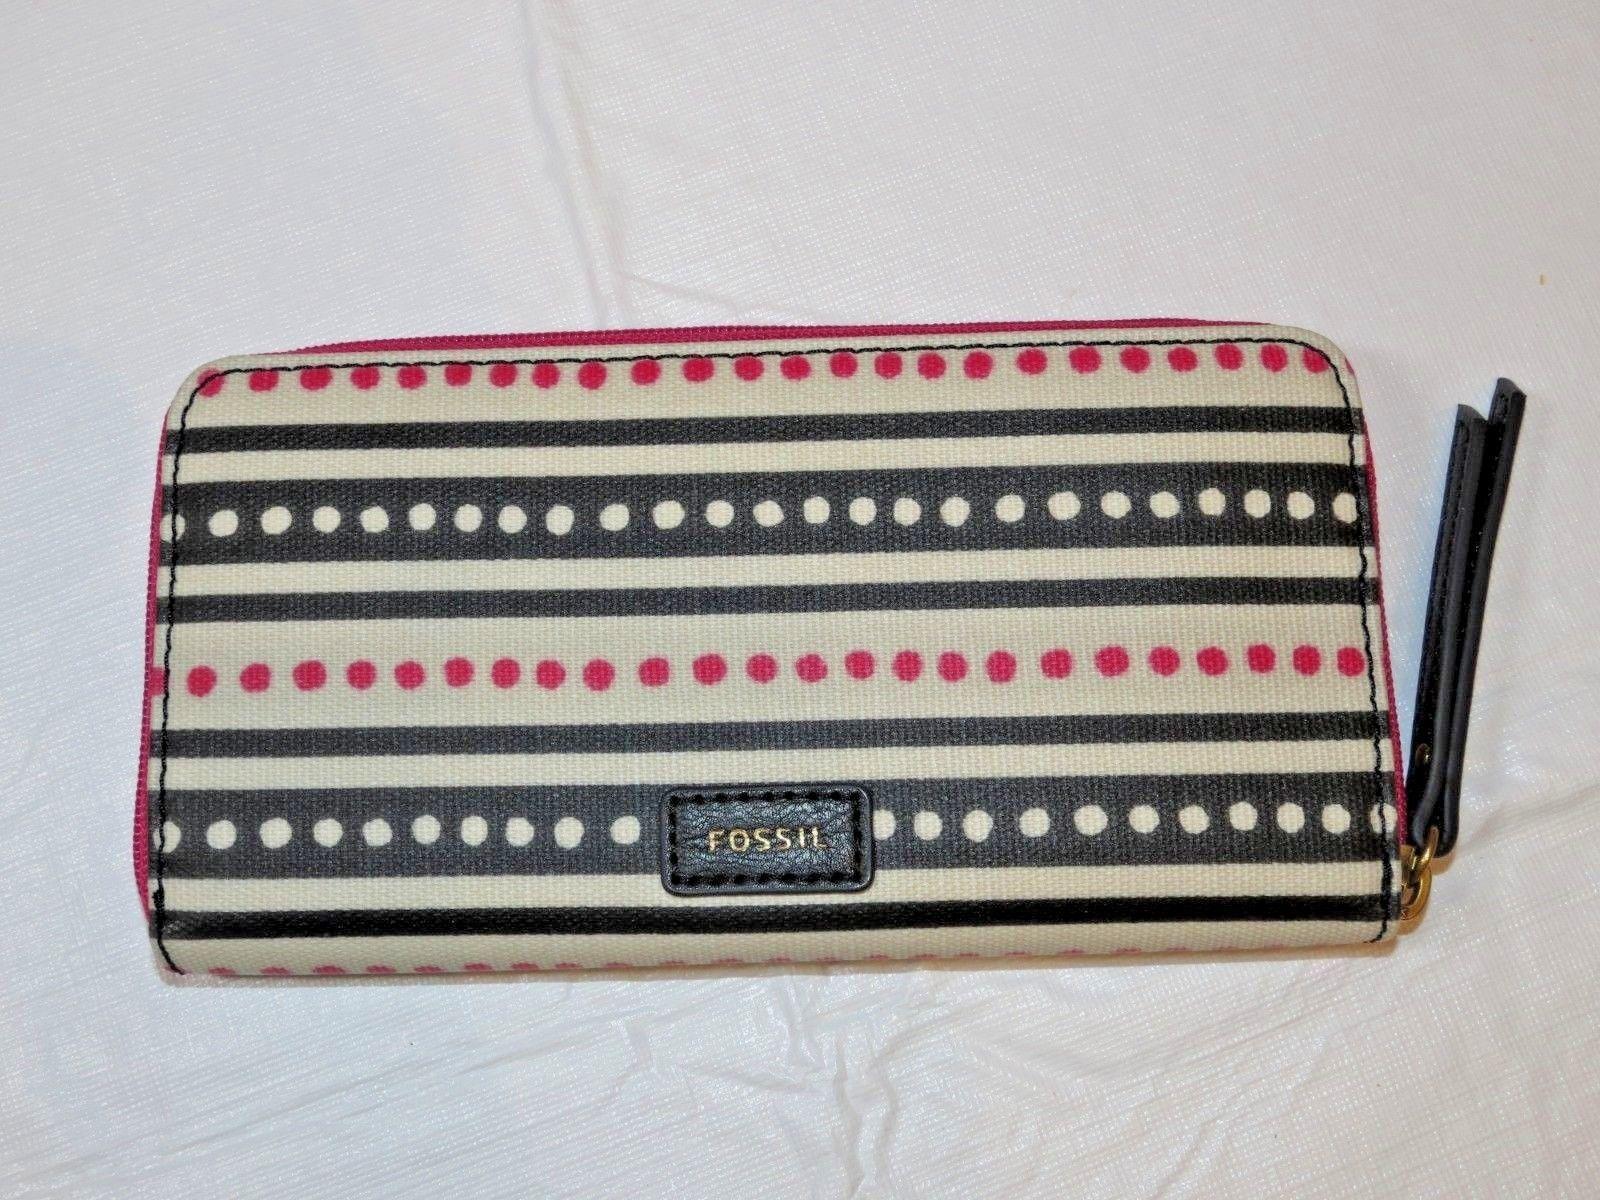 Fossil SWL2034339 Eliza Clutch Pink Dots Off white pink black clutch wallet *^